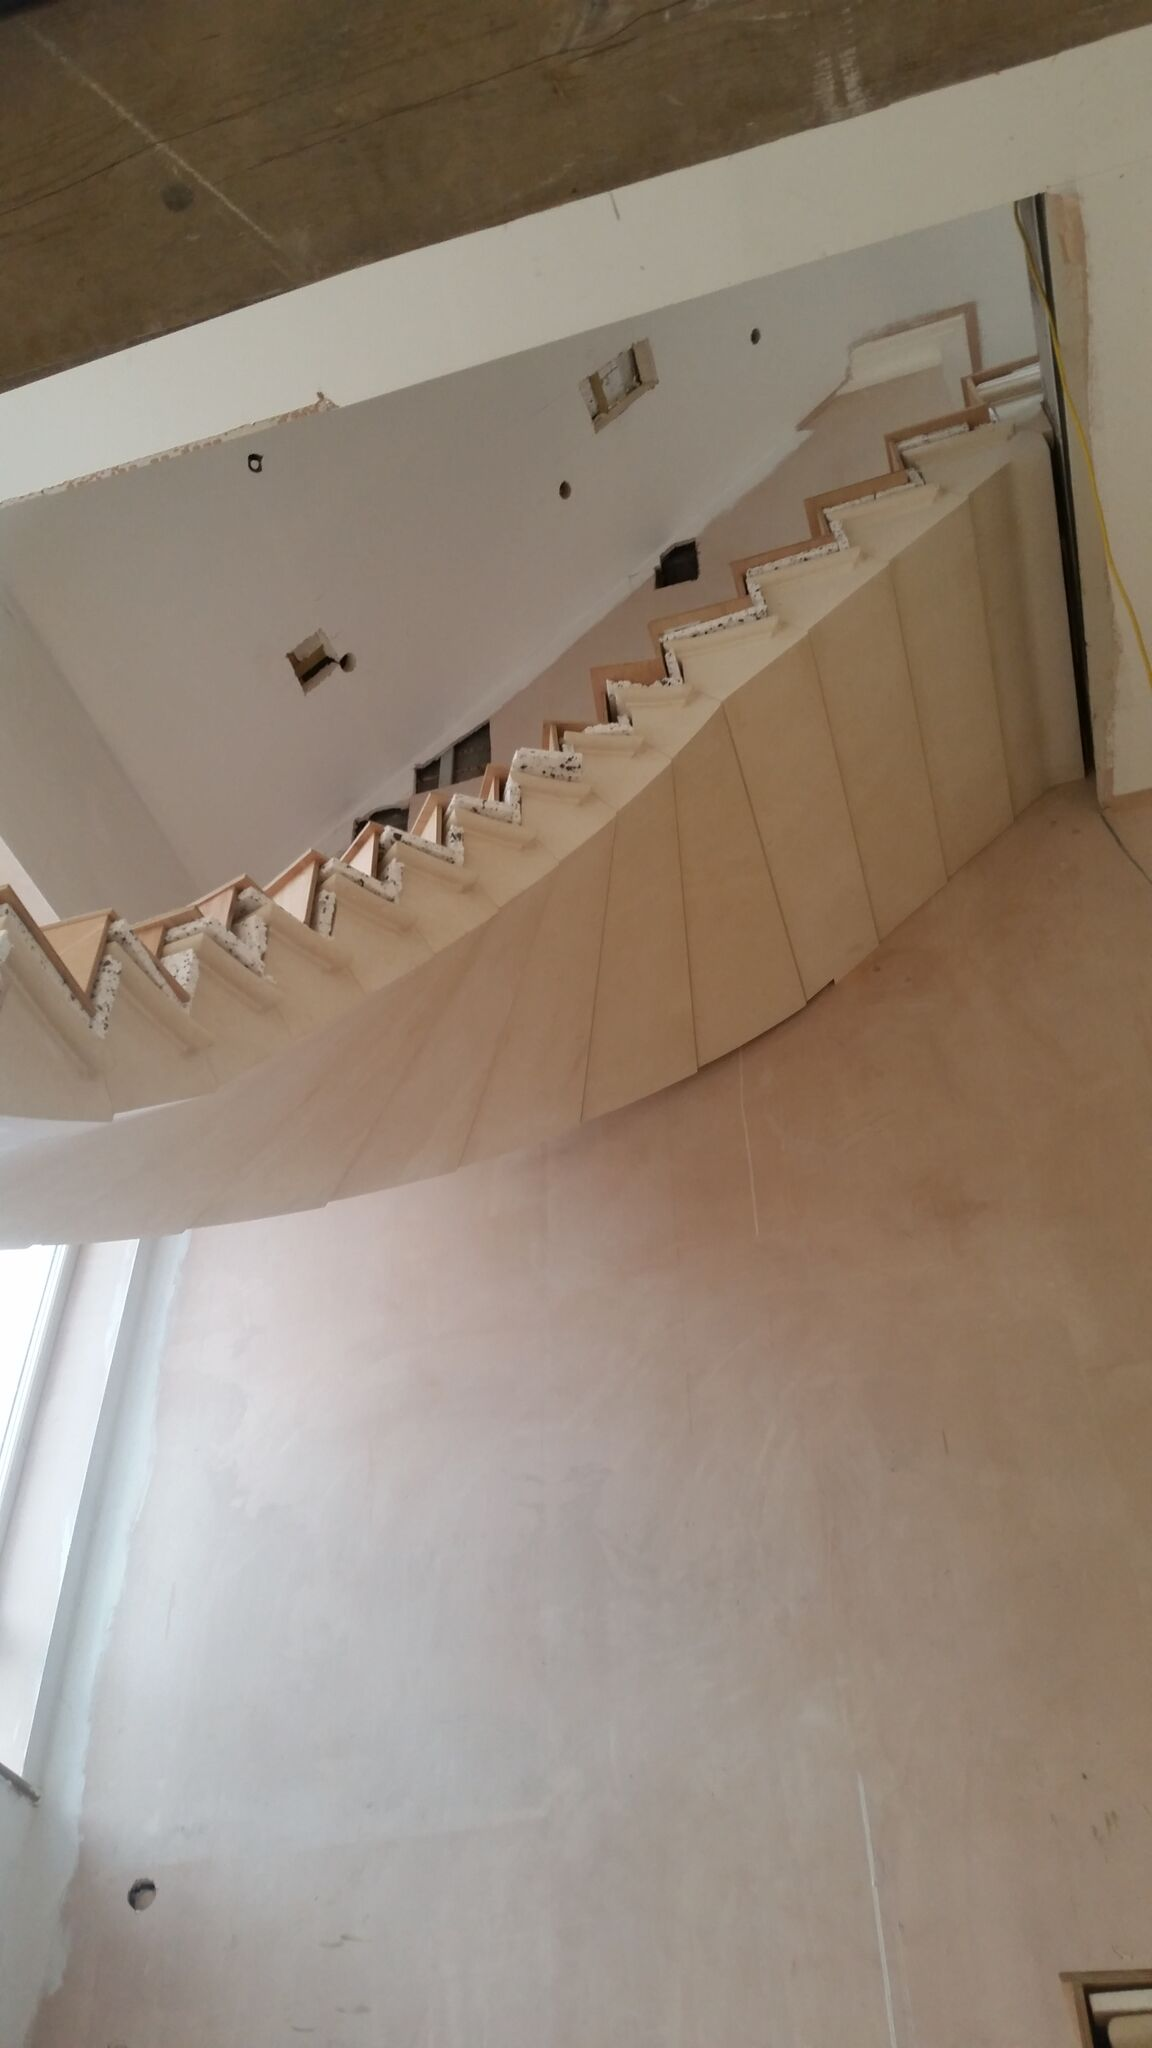 Underside of Spiral Staircase